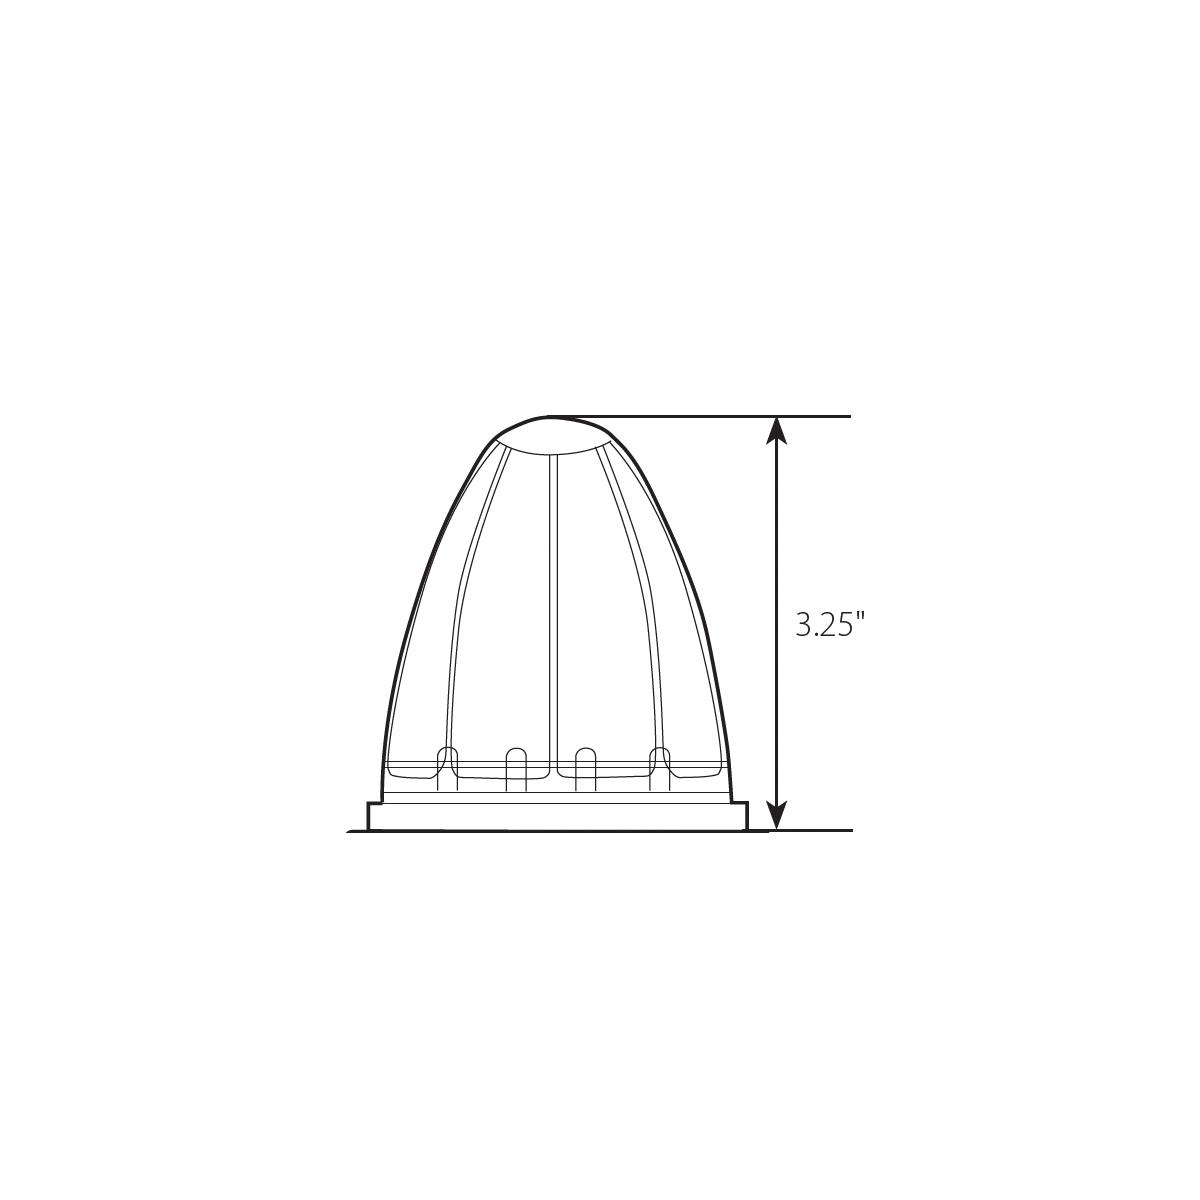 Watermelon Style Surface Mount LED Turn/Marker Light without Bezel - Diagram